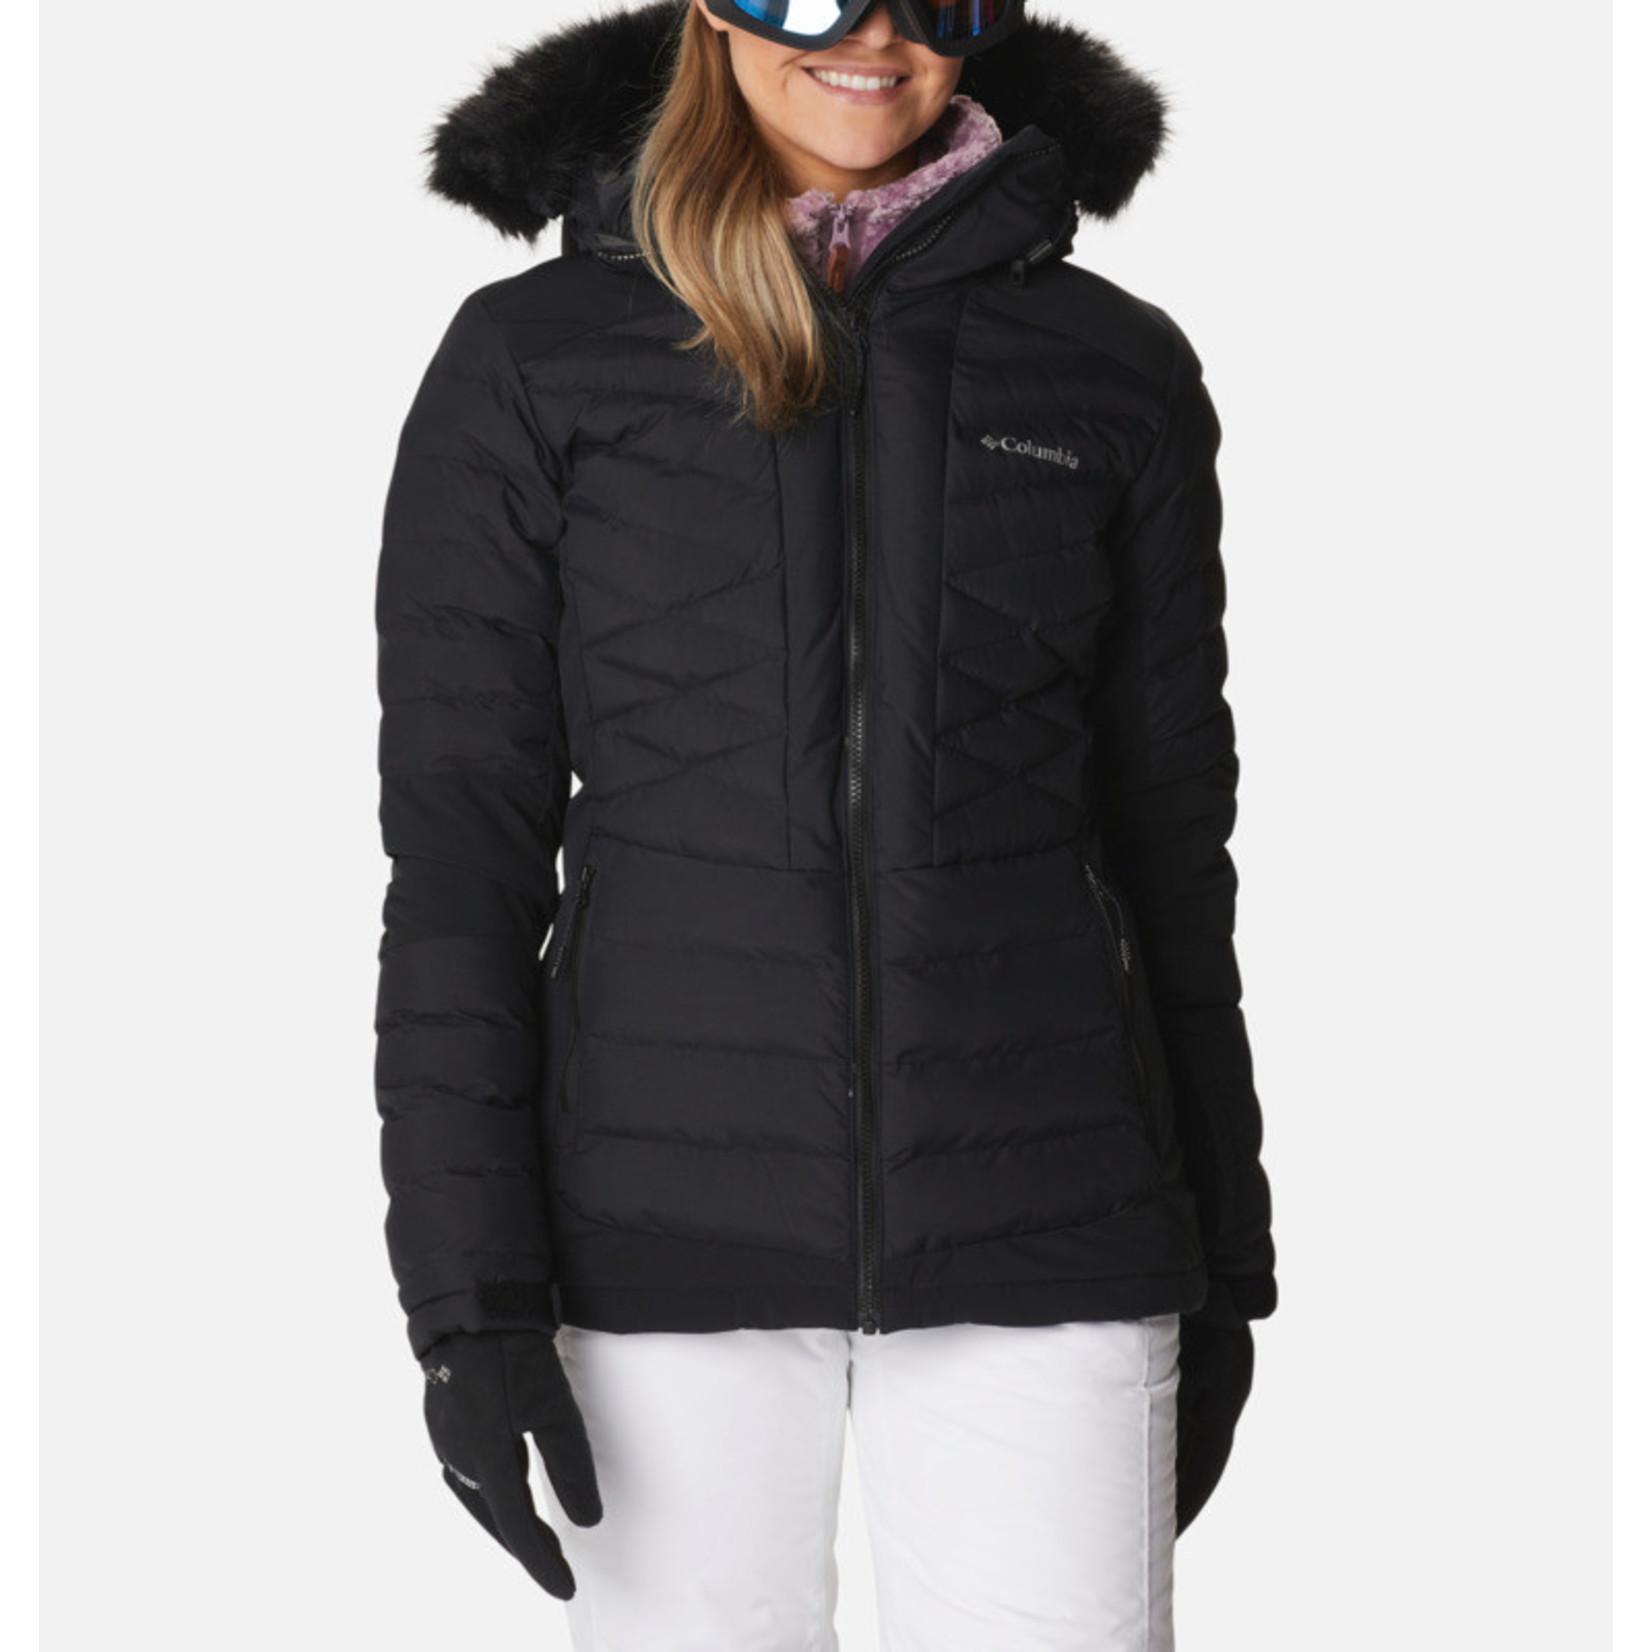 Columbia Columbia Winter Jacket, Bird Mountain Insulated, Ladies